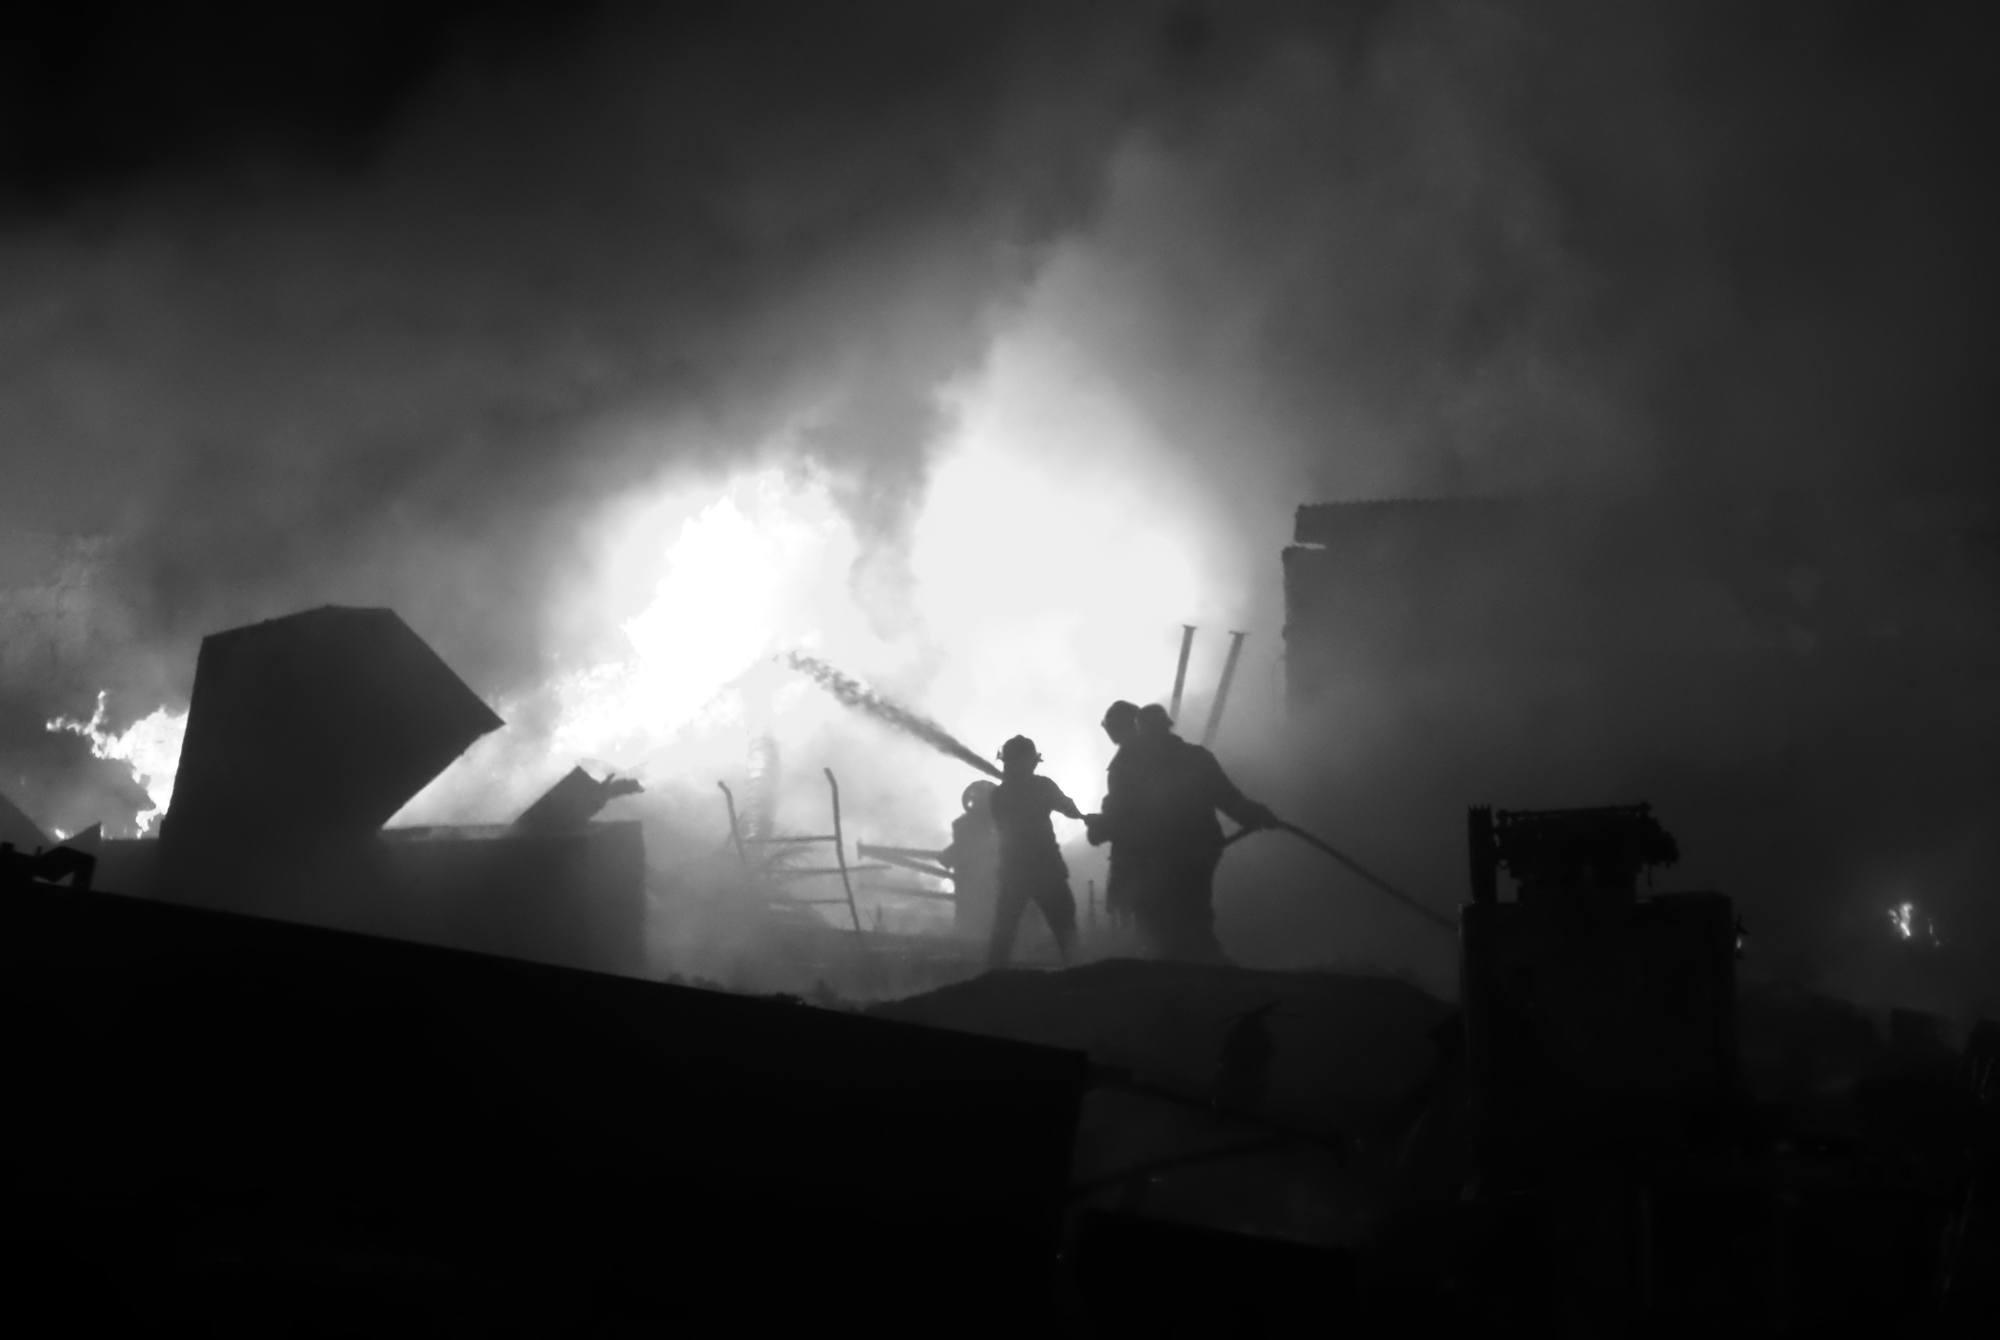 Firefighters III